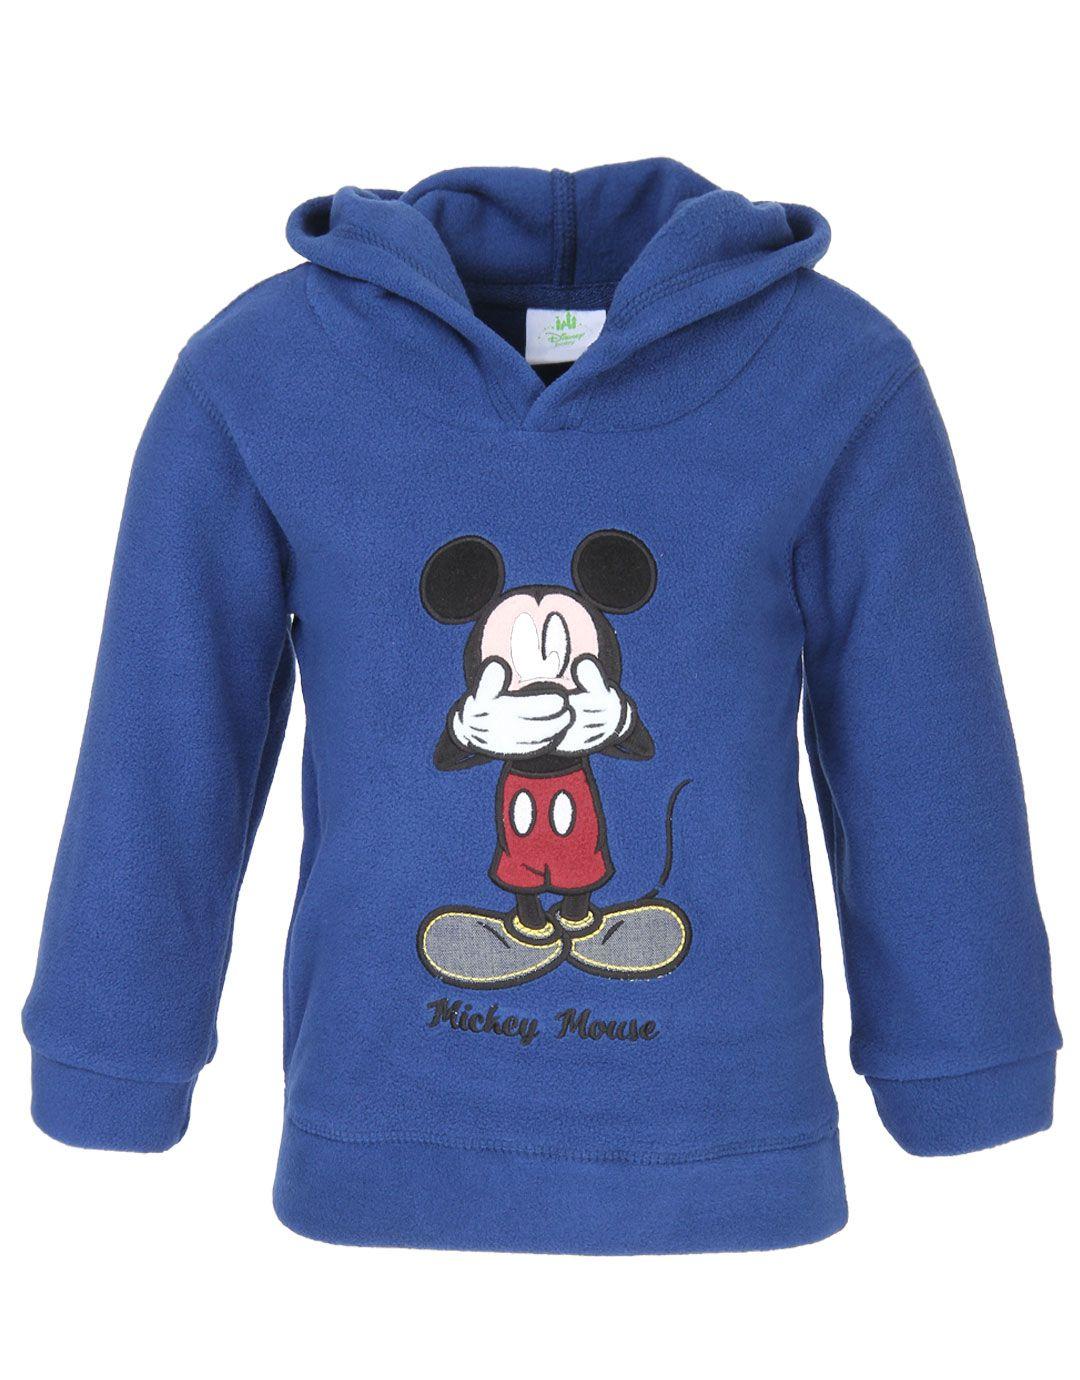 Fox Navy Sweatshirt for Girls